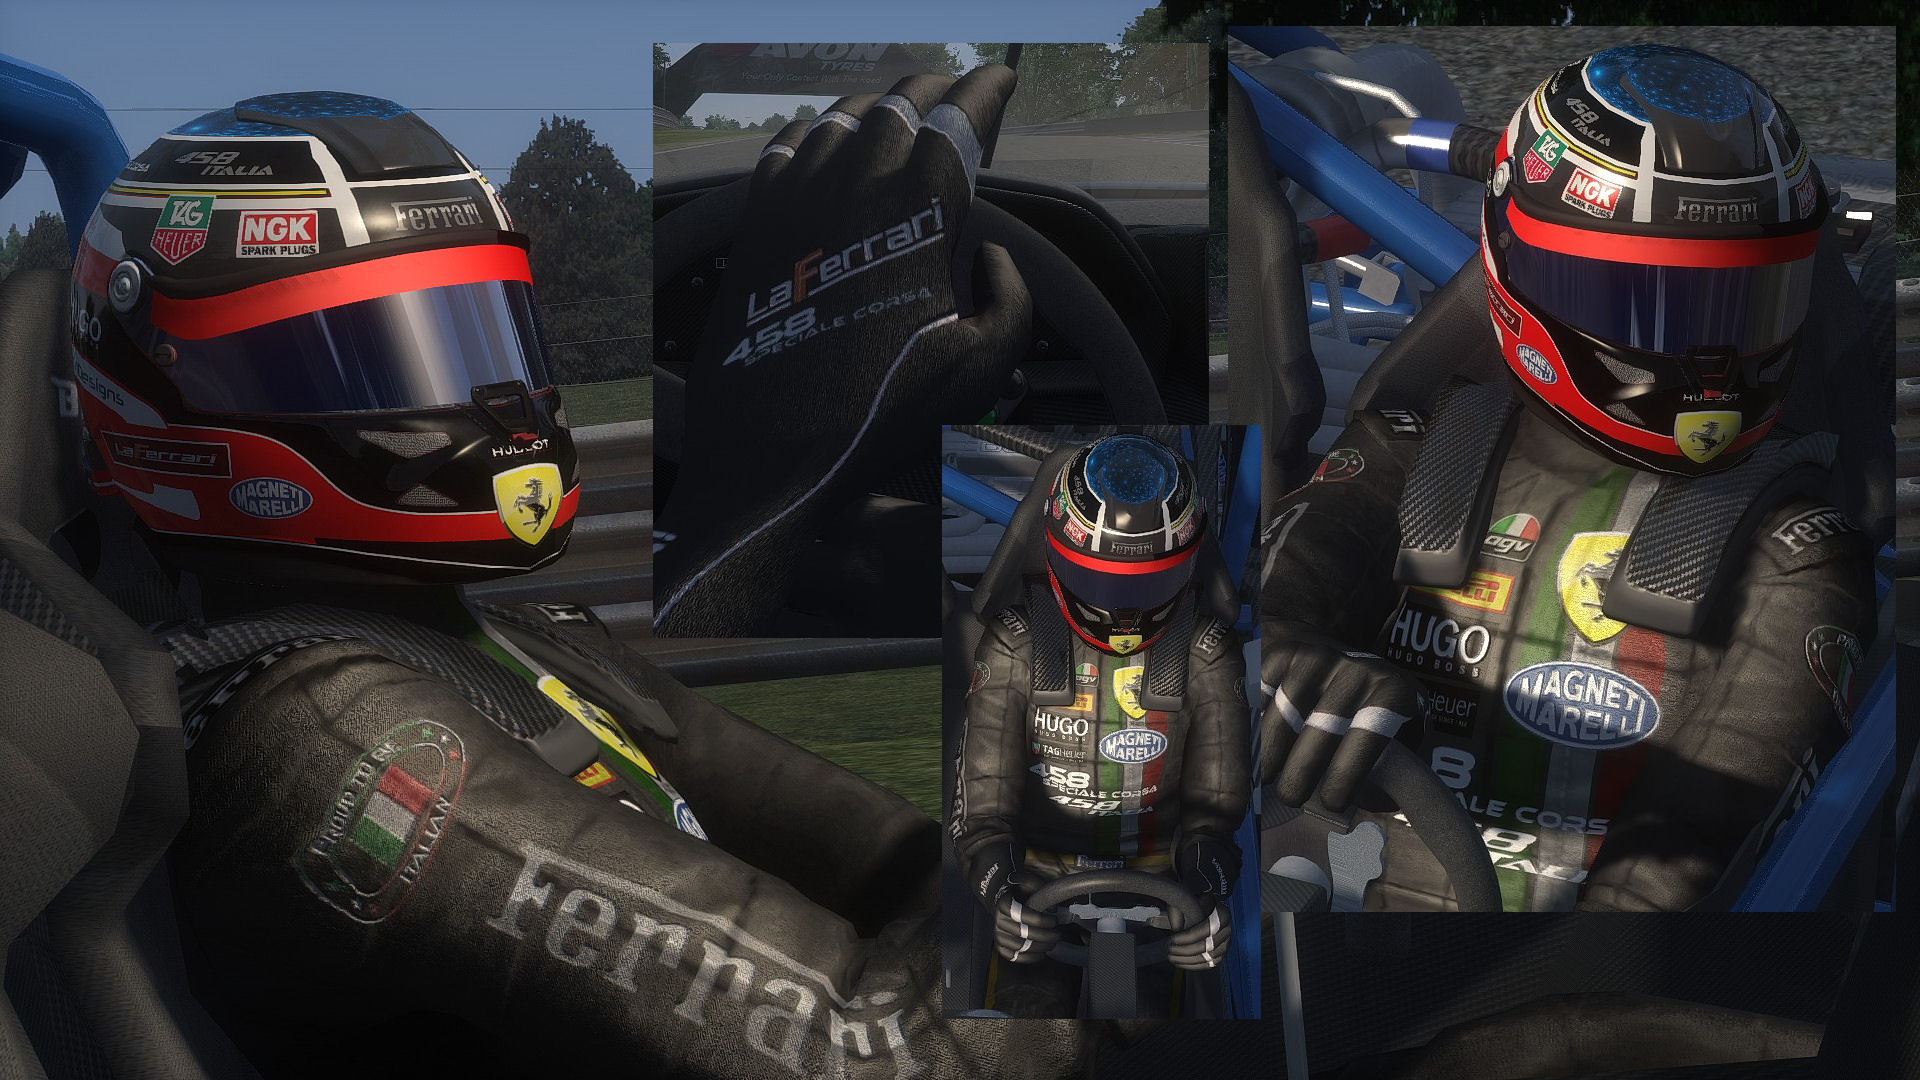 Ferrari Pro Driver DELUXE Suit RC1.jpg